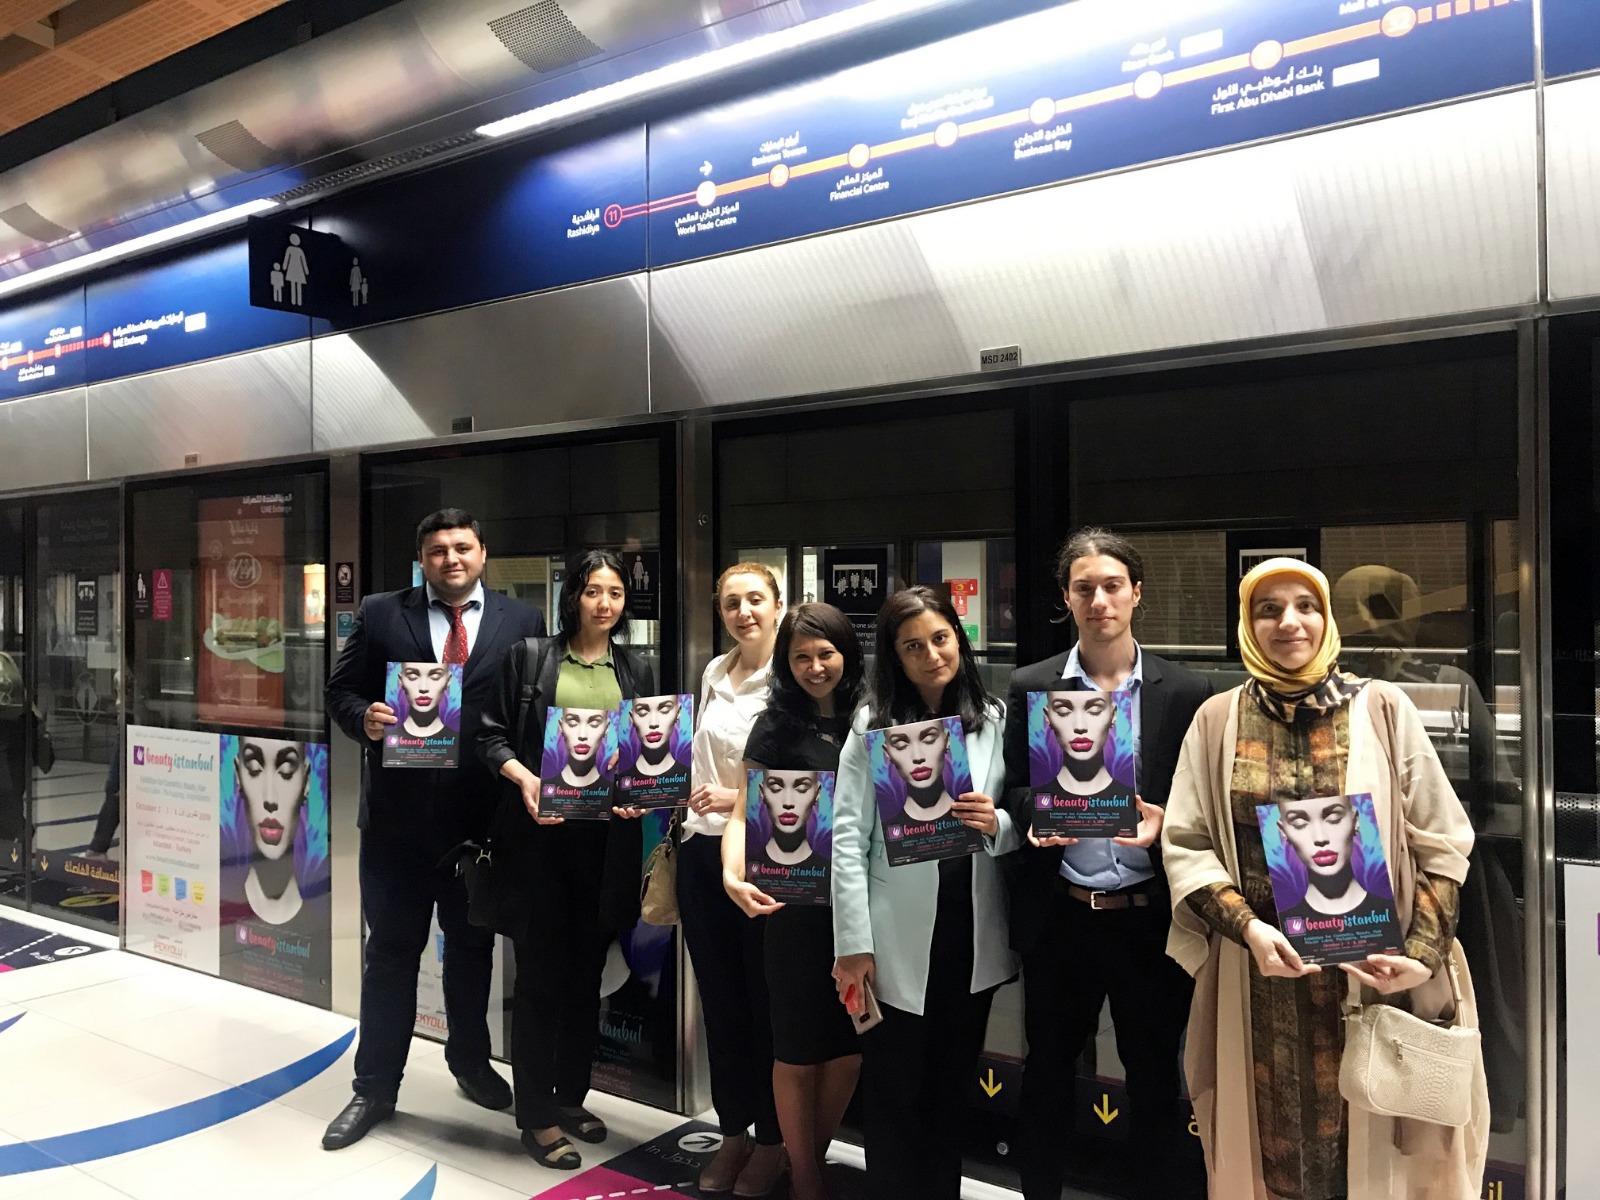 Dubai Metro Advertisement Dubai-United Arab Emirates, May 2018